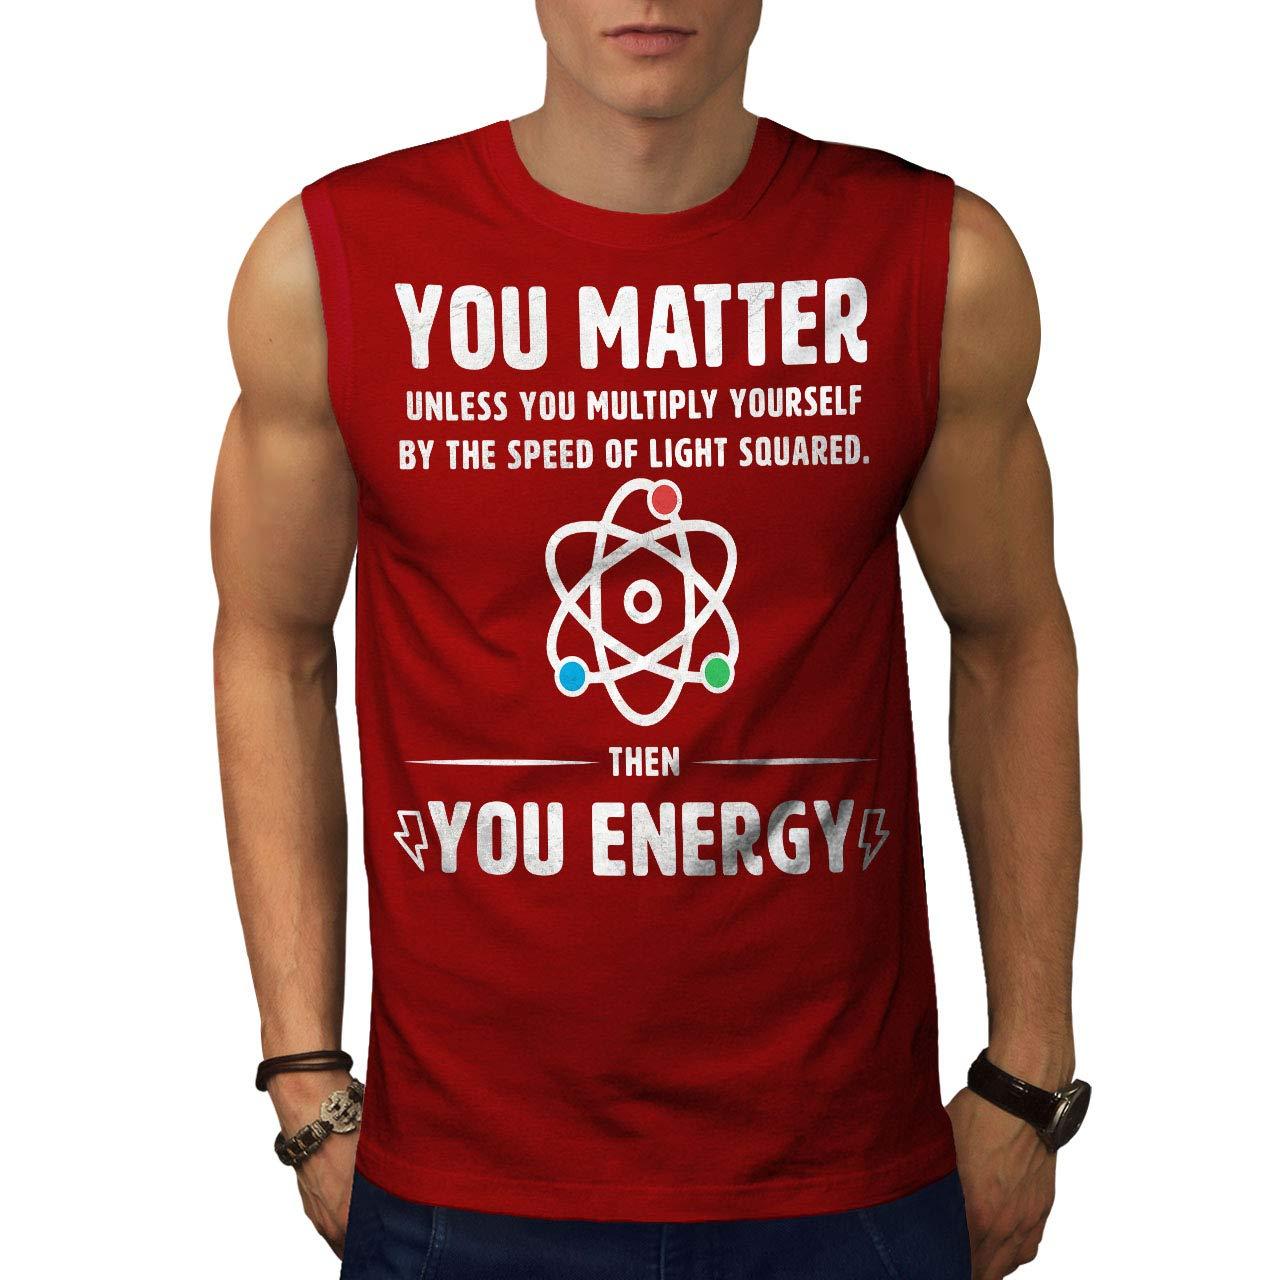 Wellcoda Physics Science Funny Mens Sleevless T-Shirt, You Matter Active Top Shirt